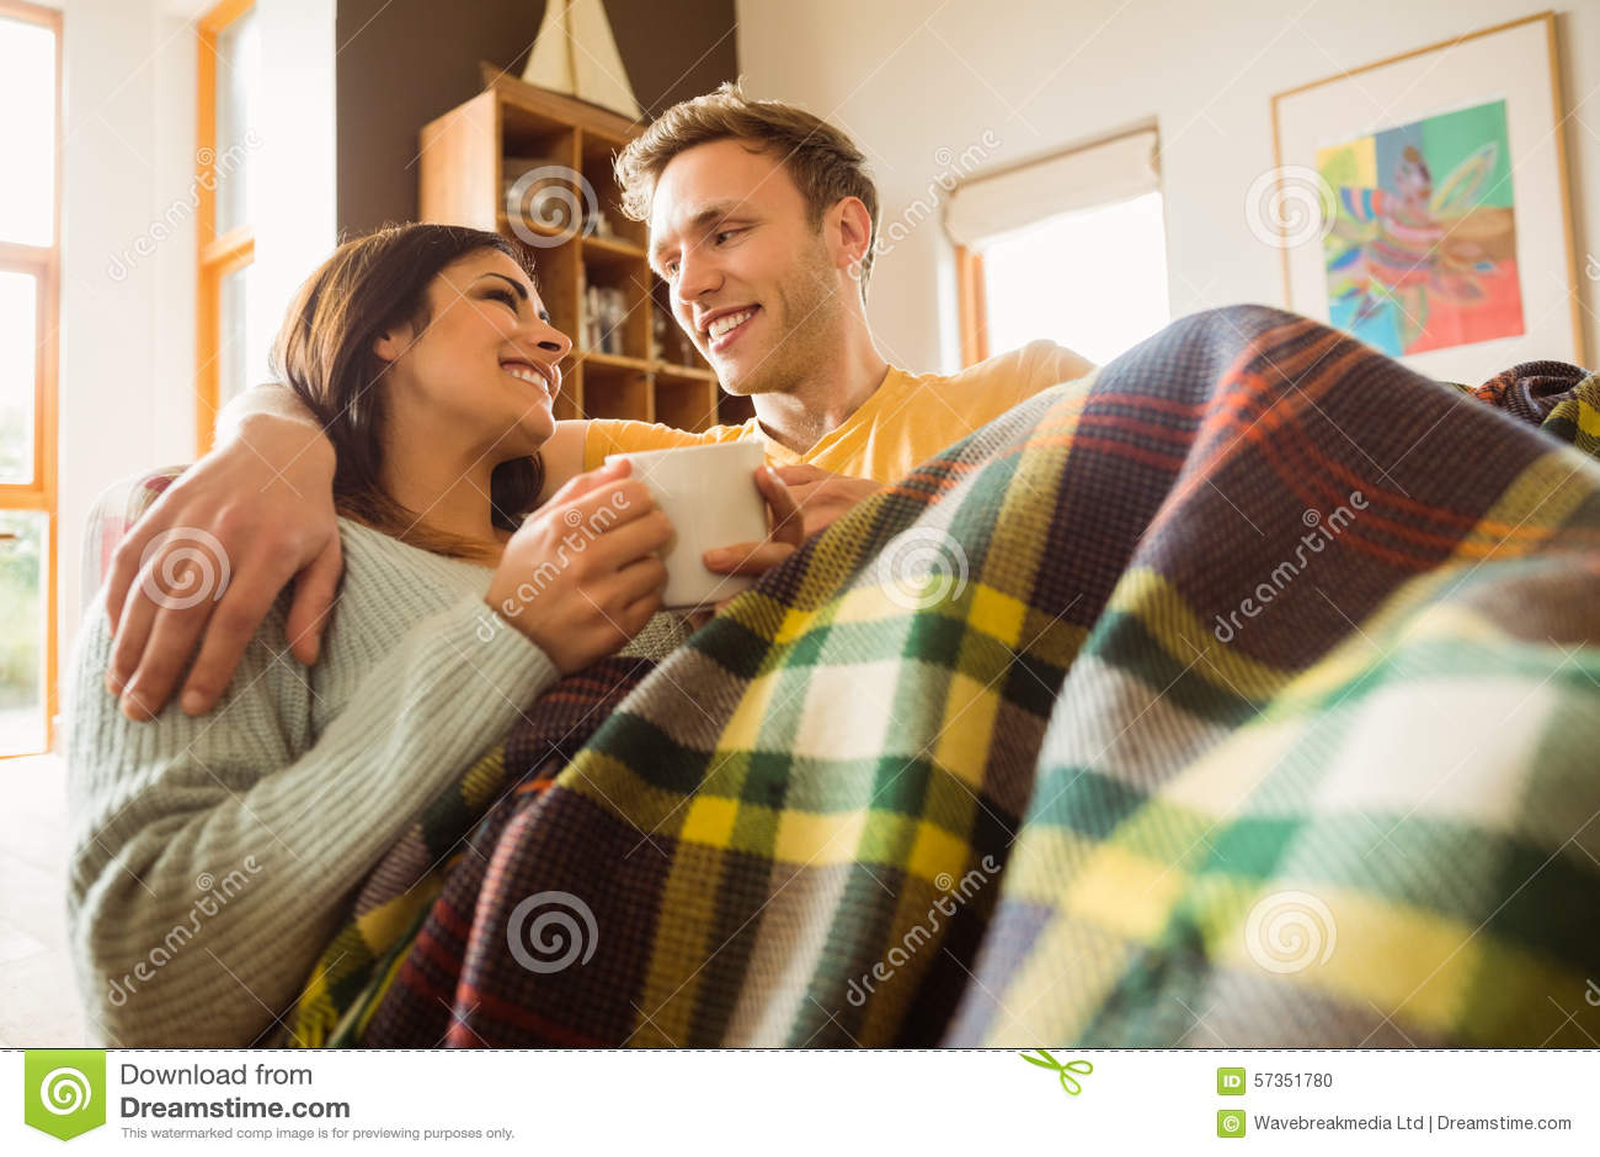 Cuddling under a blanket